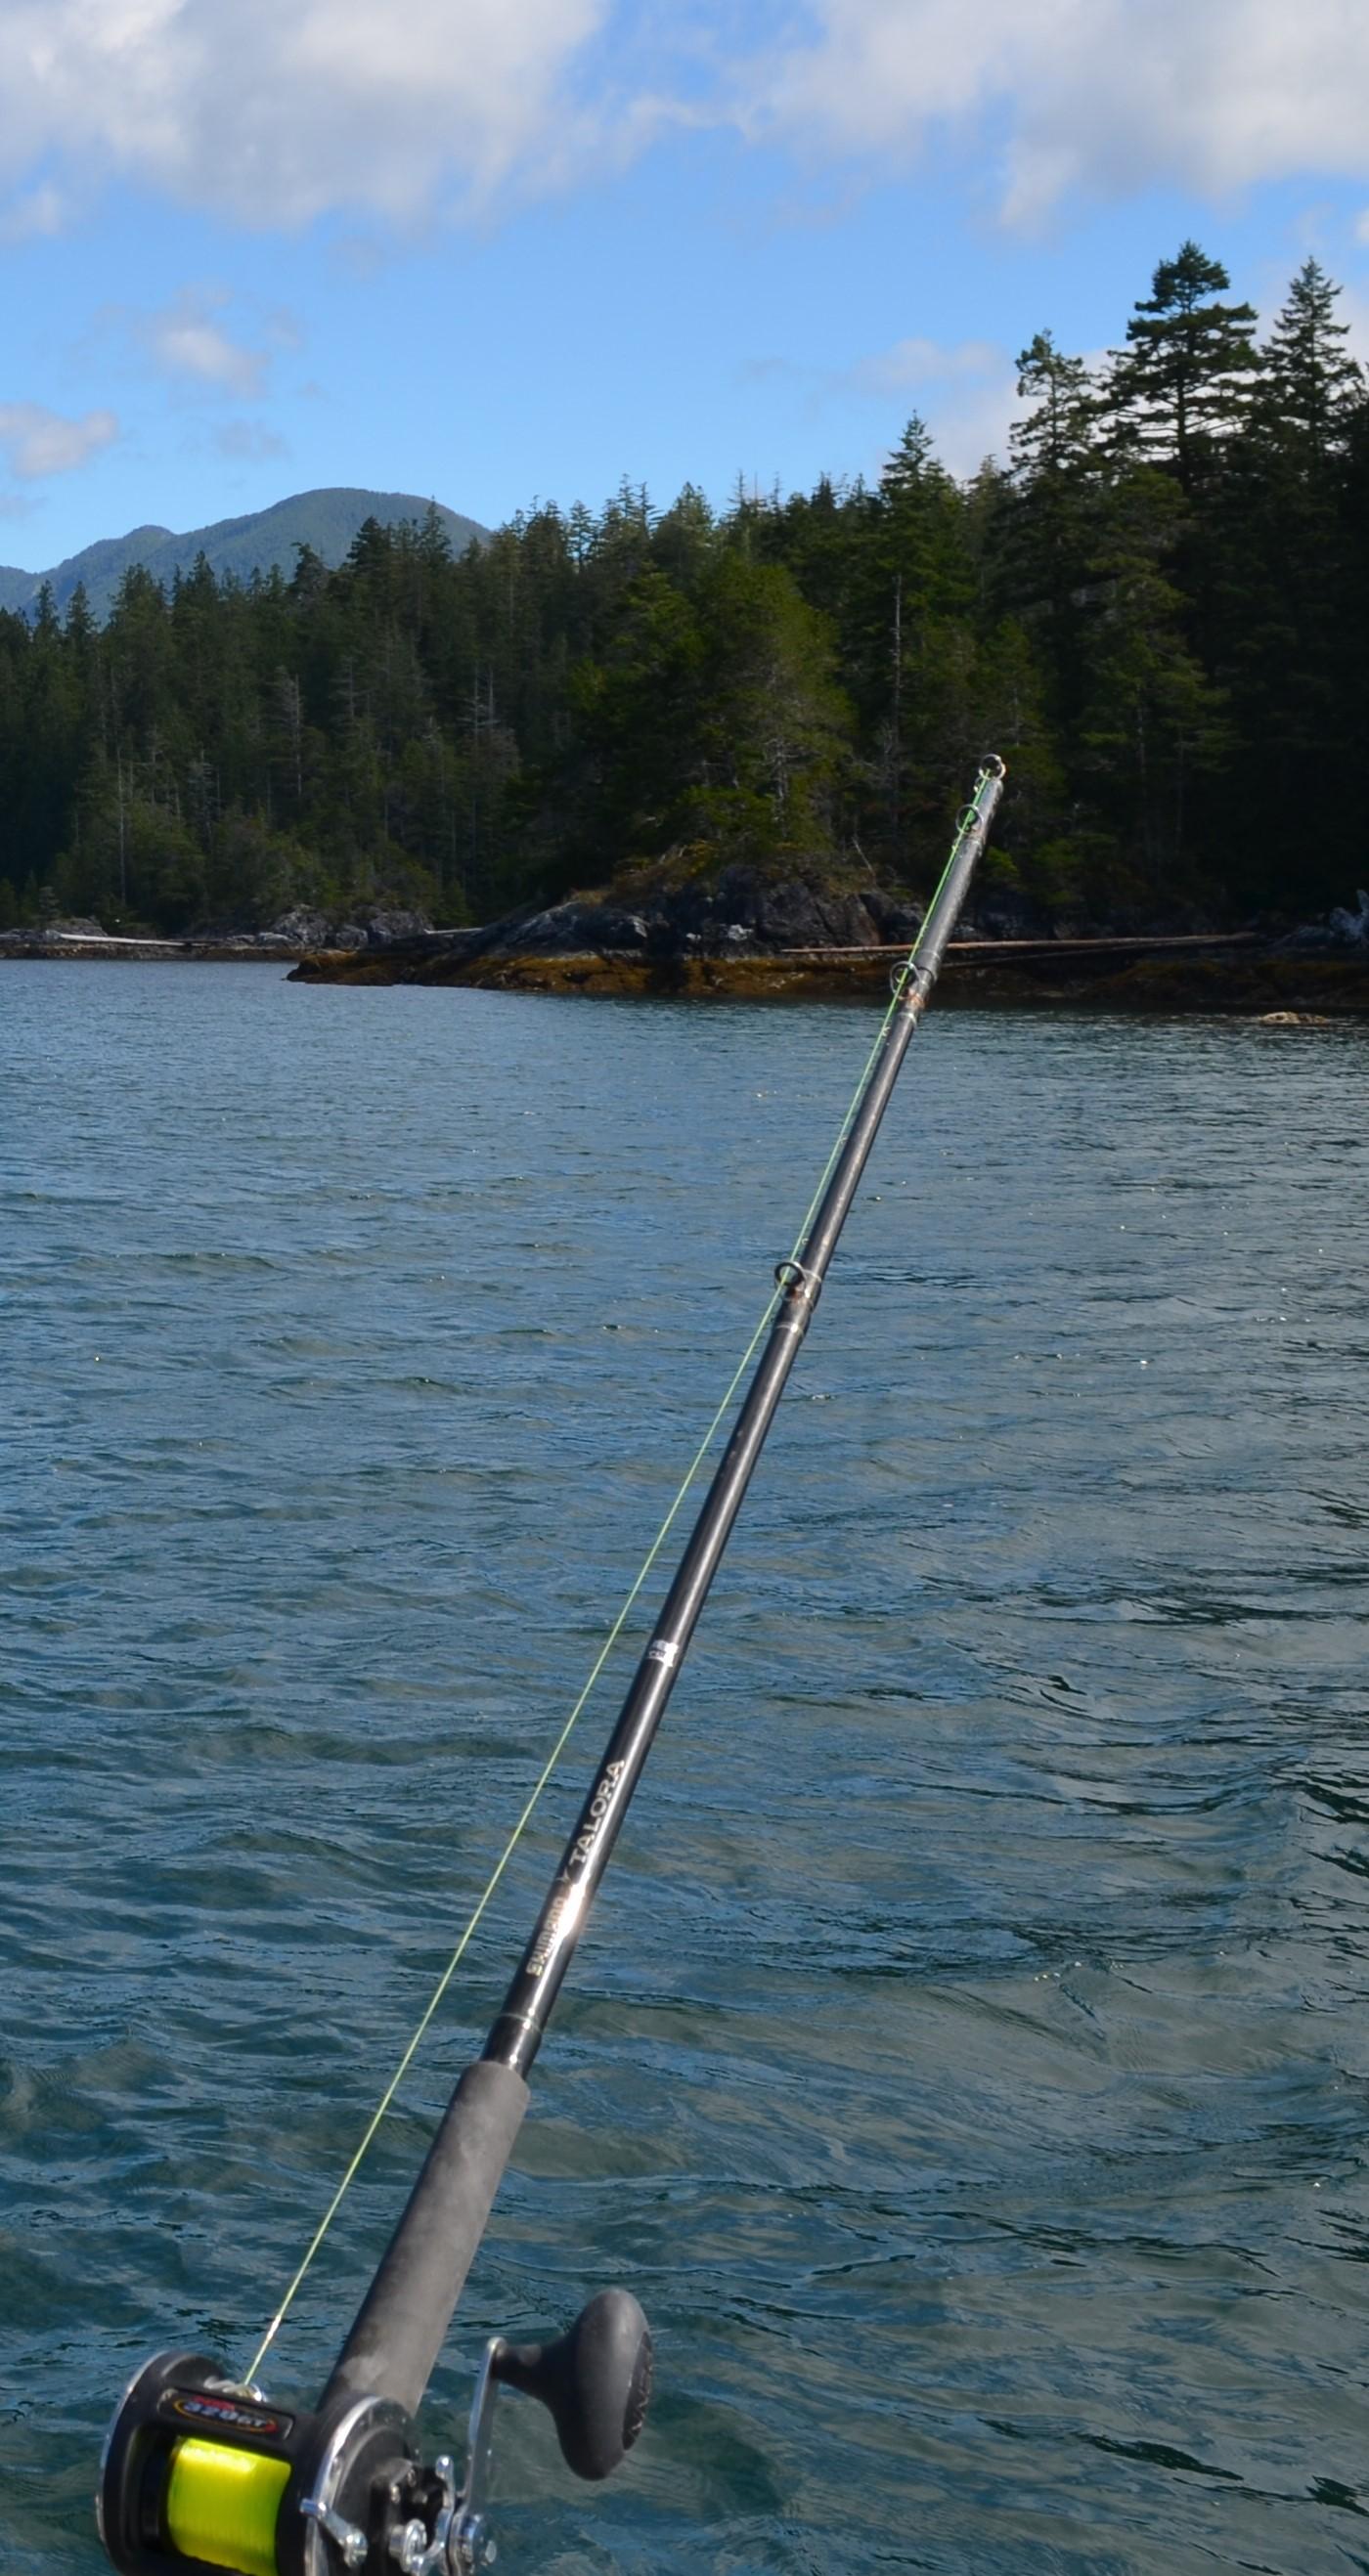 FishingRod